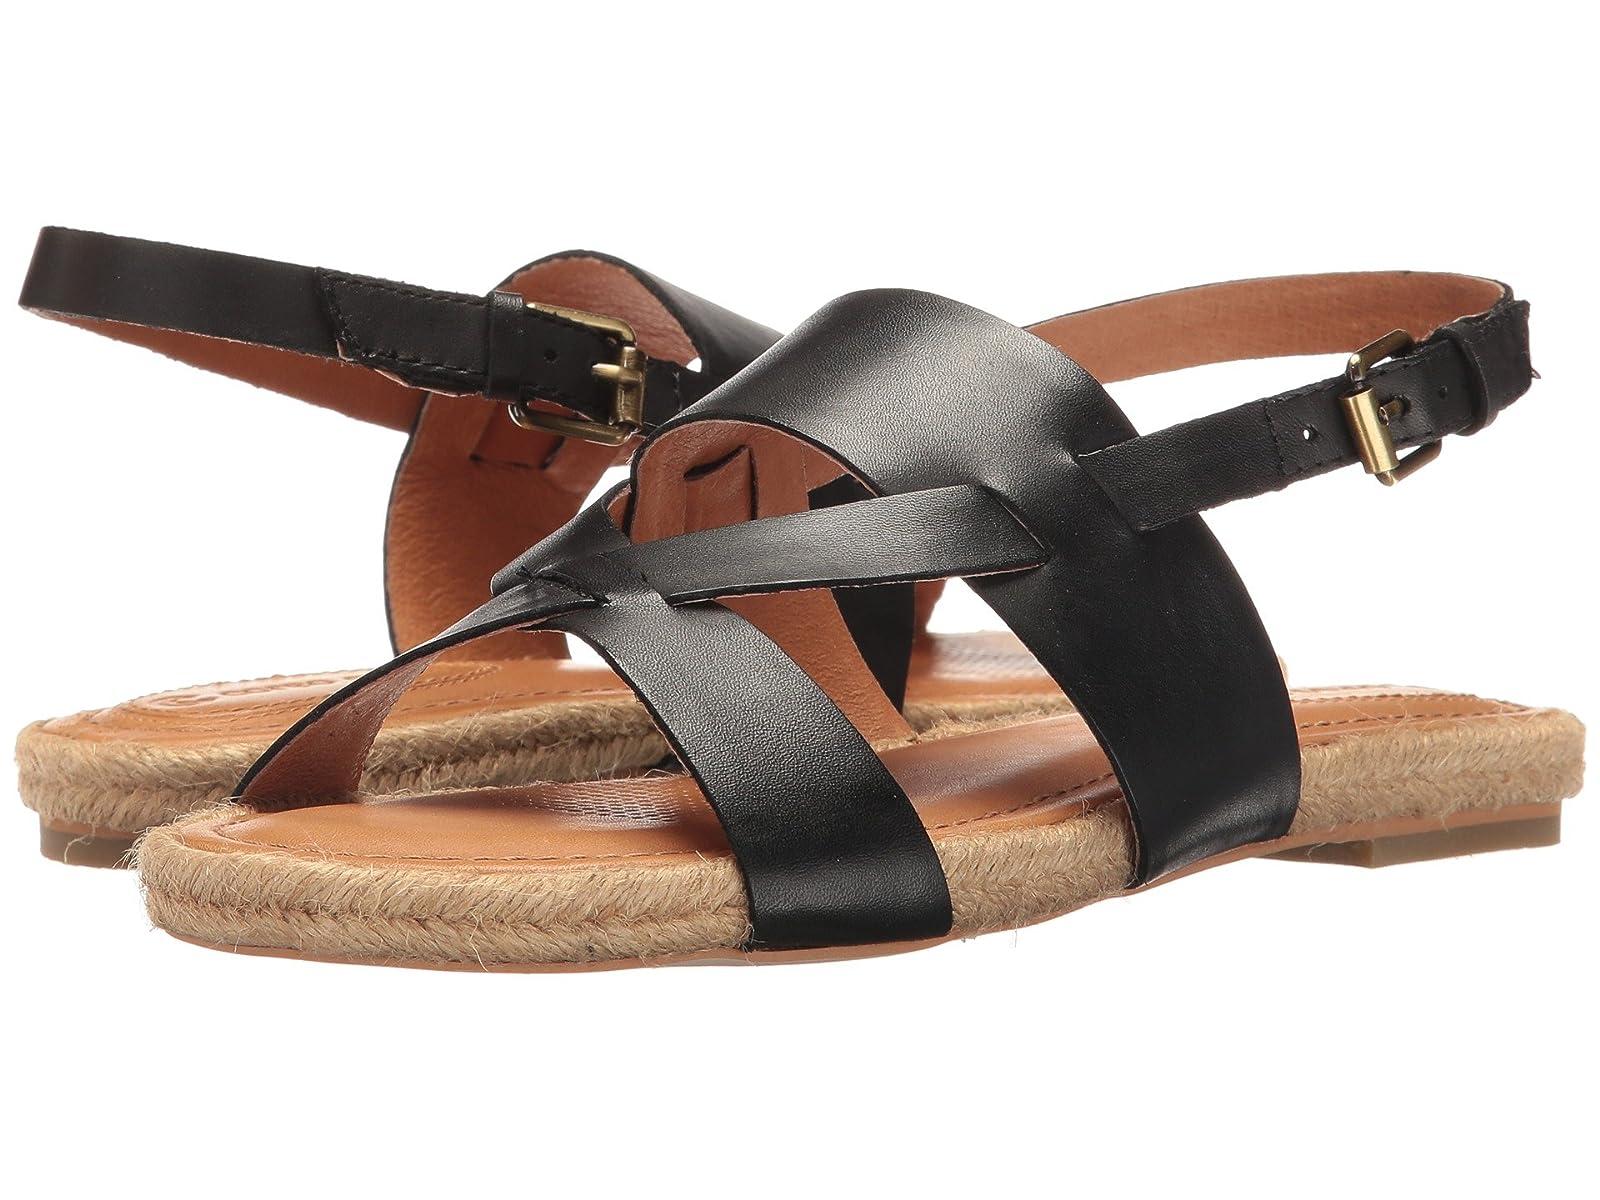 CC Corso Como Pine KeyCheap and distinctive eye-catching shoes